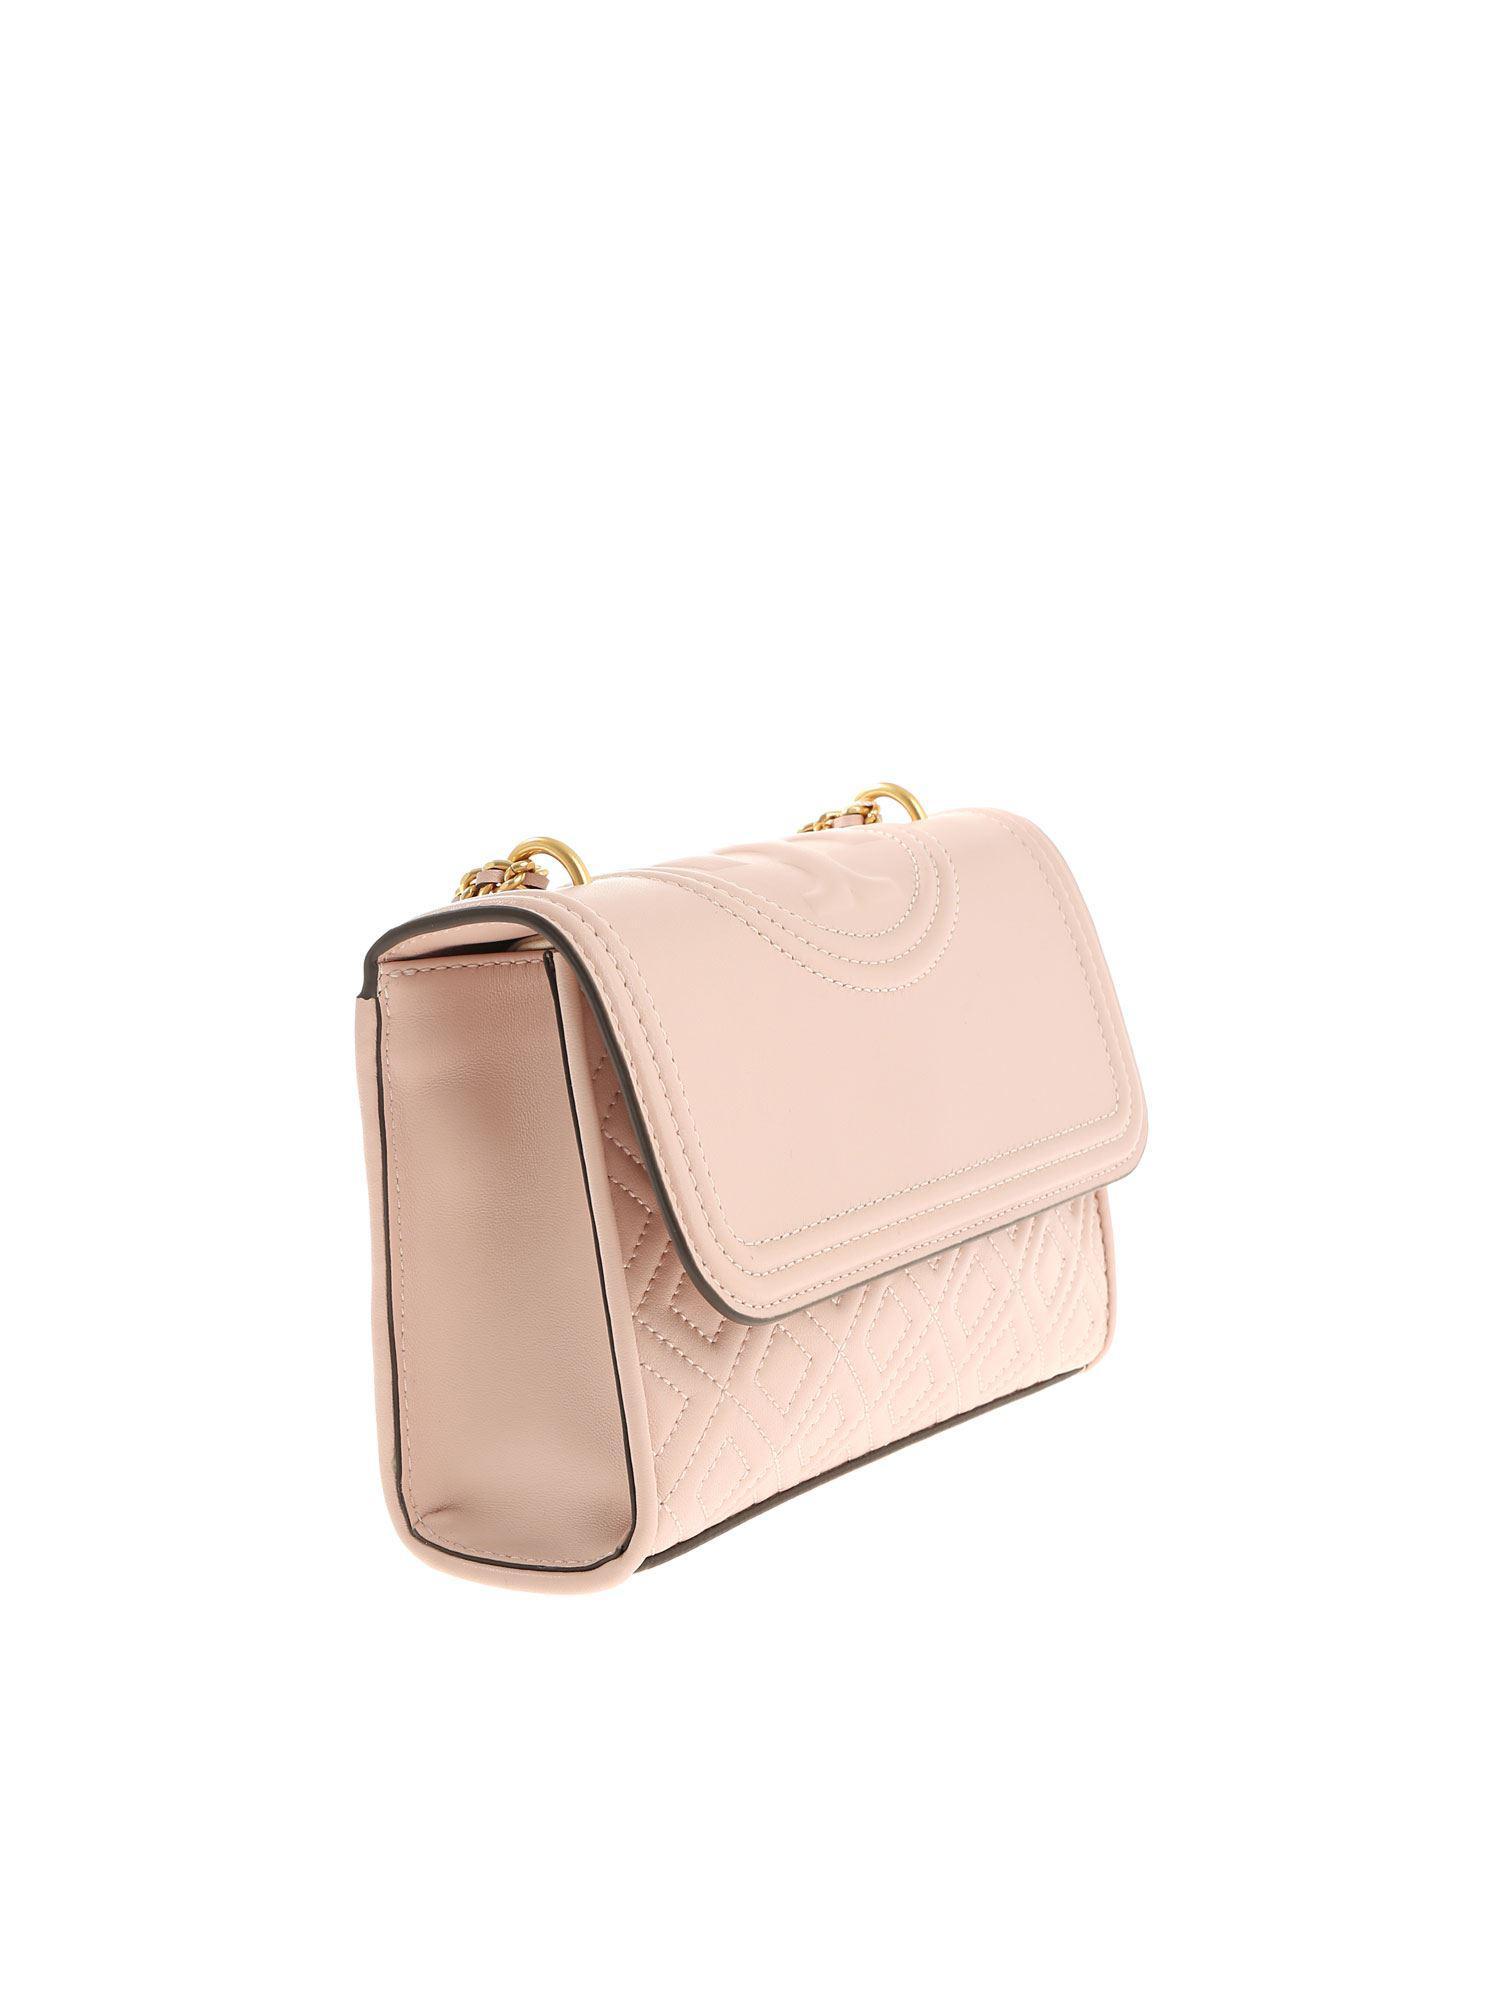 ed12d0e3c119 Tory Burch - Pink Mini Bag Shoulder Bag Women - Lyst. View fullscreen